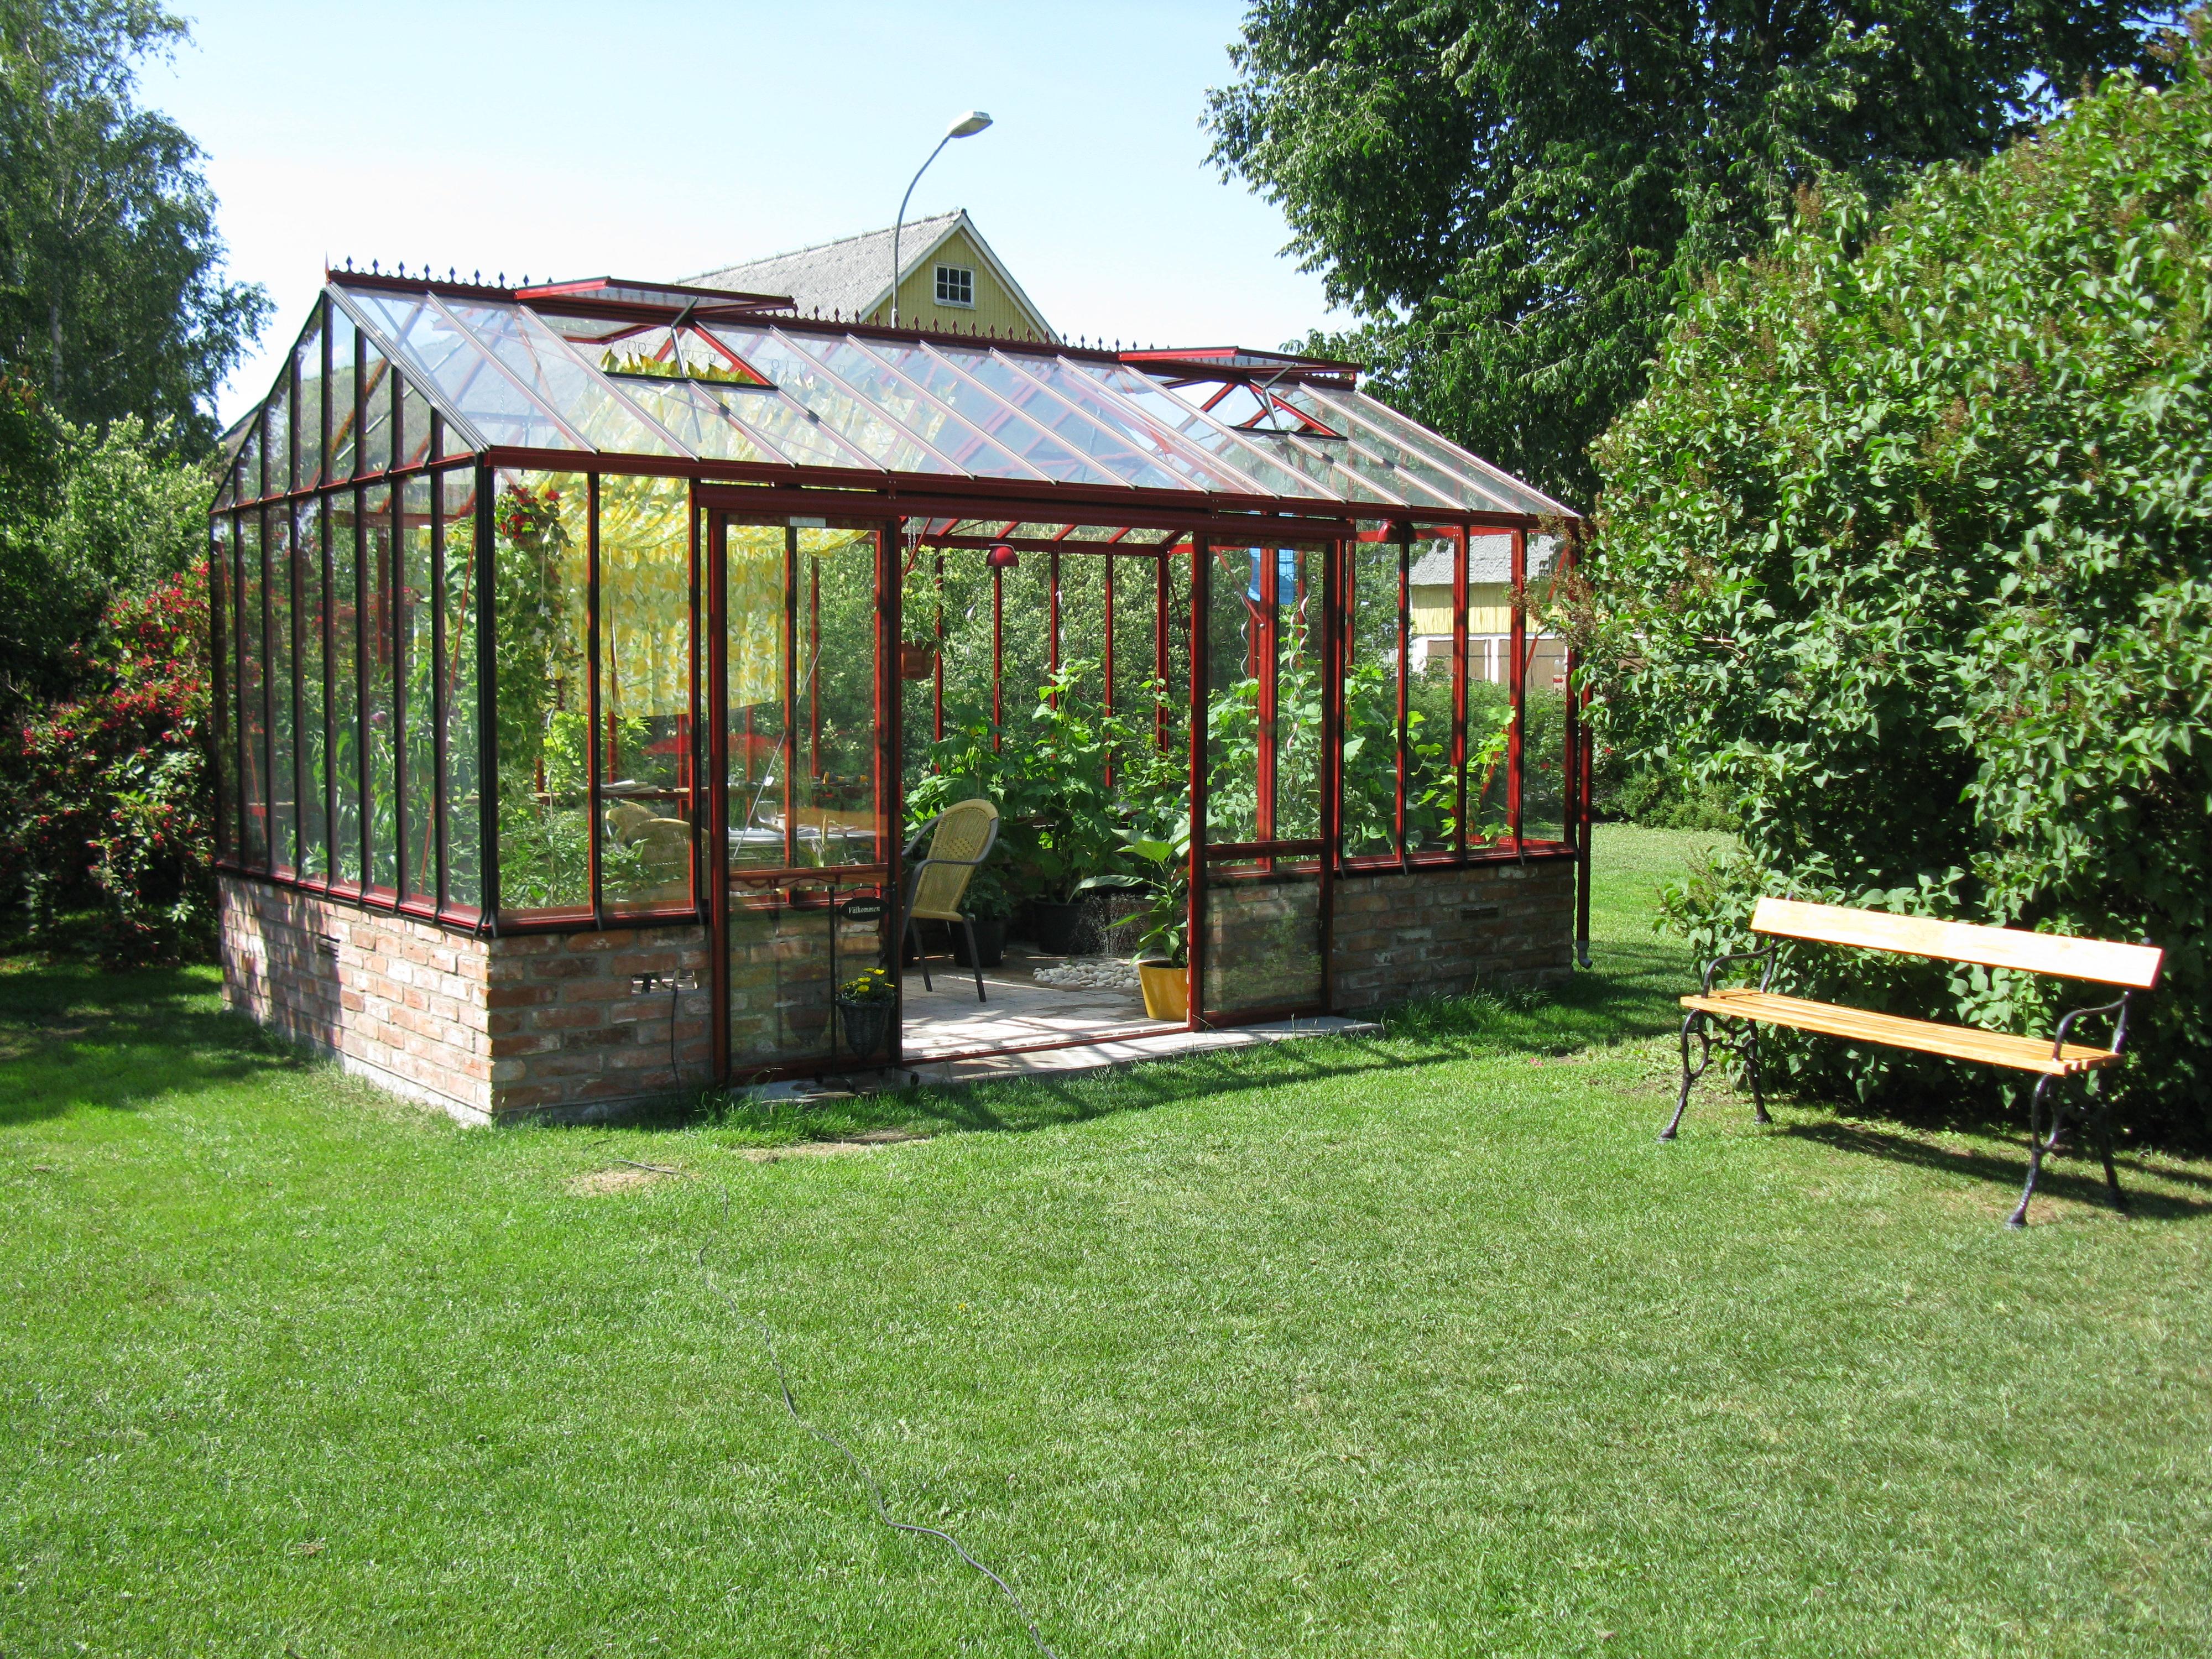 Freestanding greenhouses